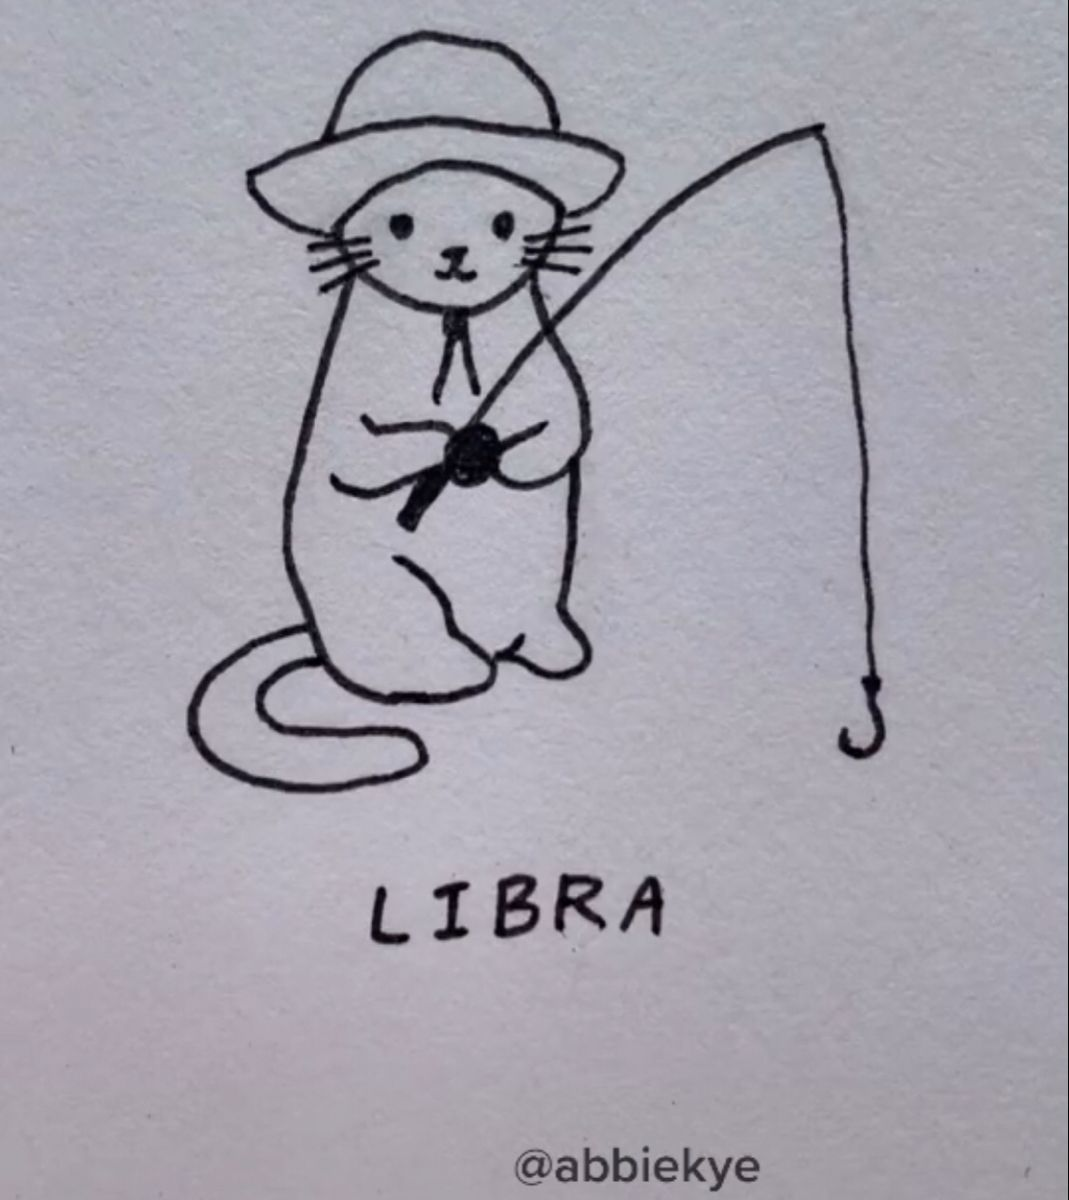 Libra Cat Tattoo Mini Drawings Easy Love Drawings Easy Doodles Drawings